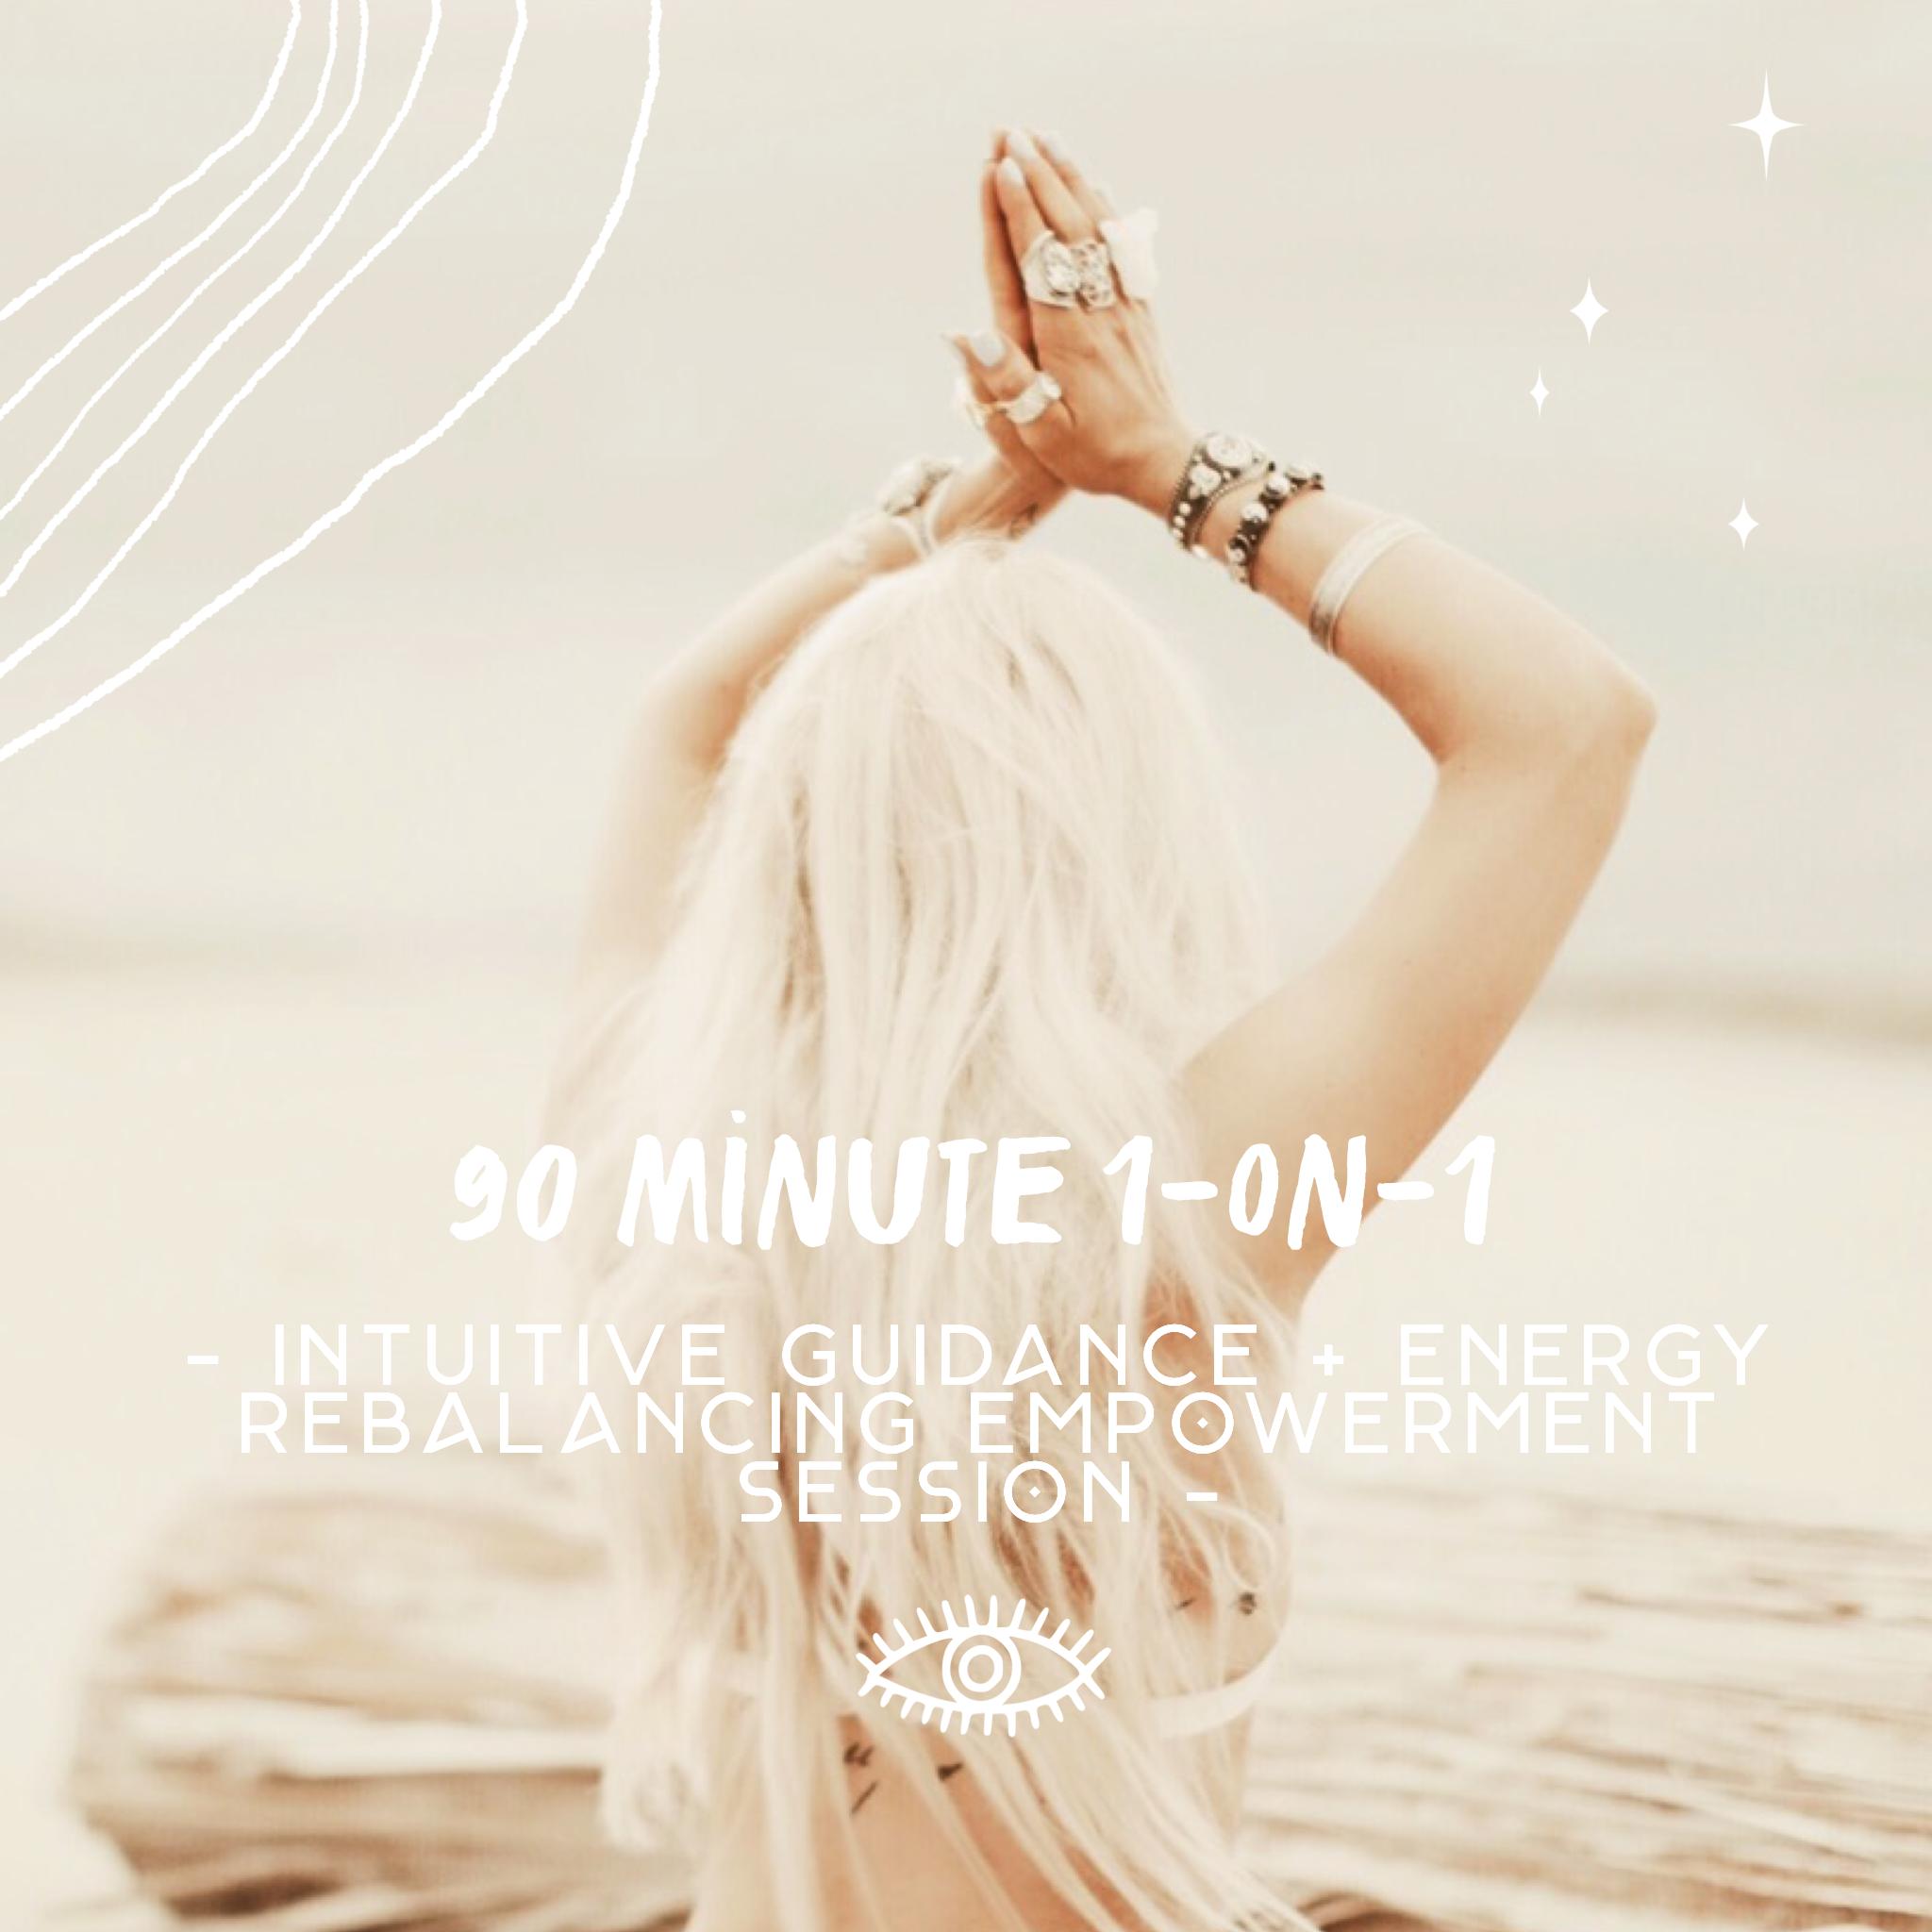 90 min SELF-EMPOWERMENT SESSION